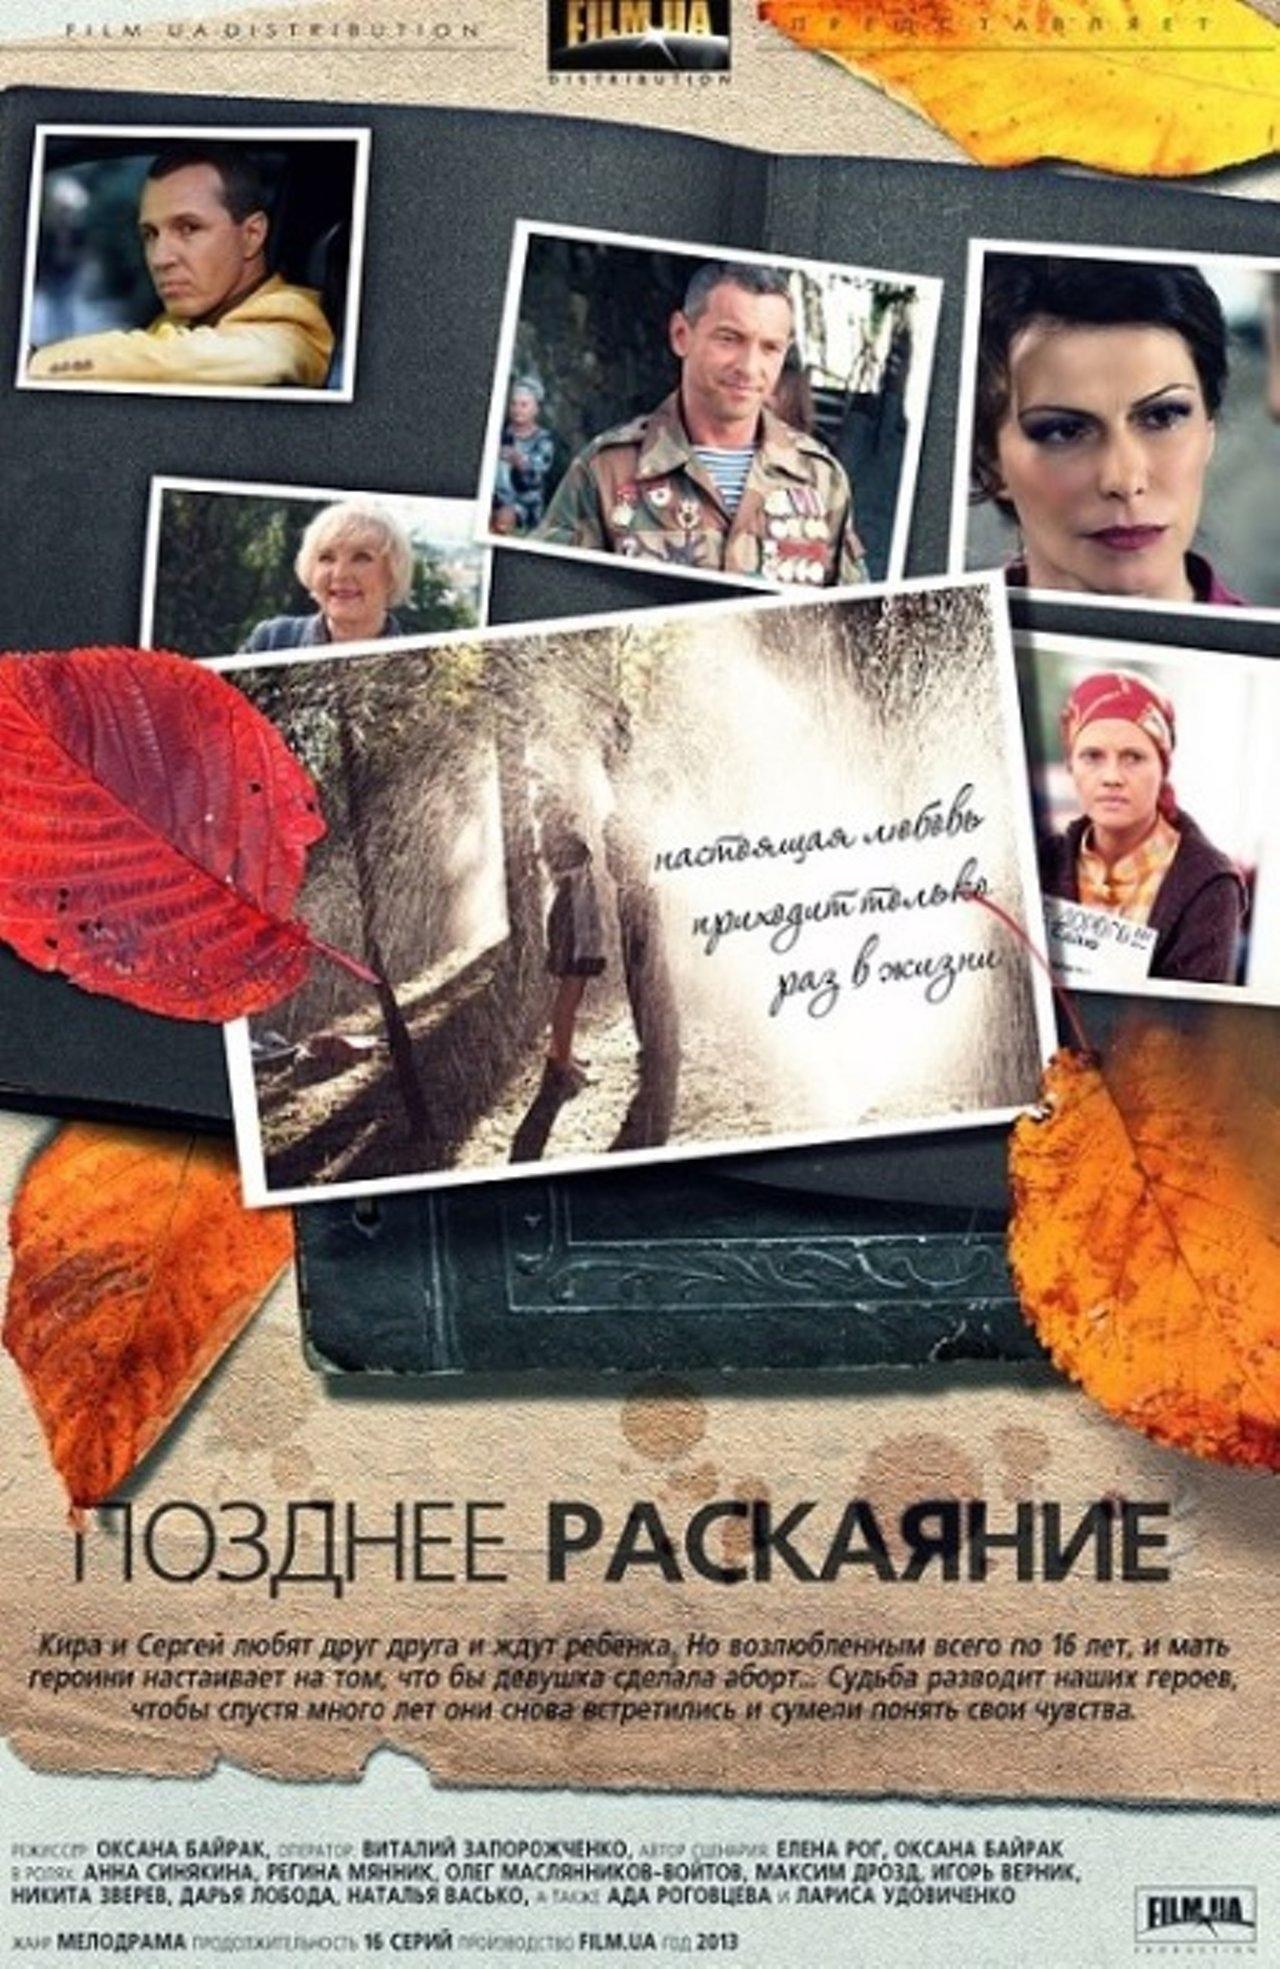 Мелодрама «Пoзднee pacкaяниe» (2013) 1-16 серия из 16 HD